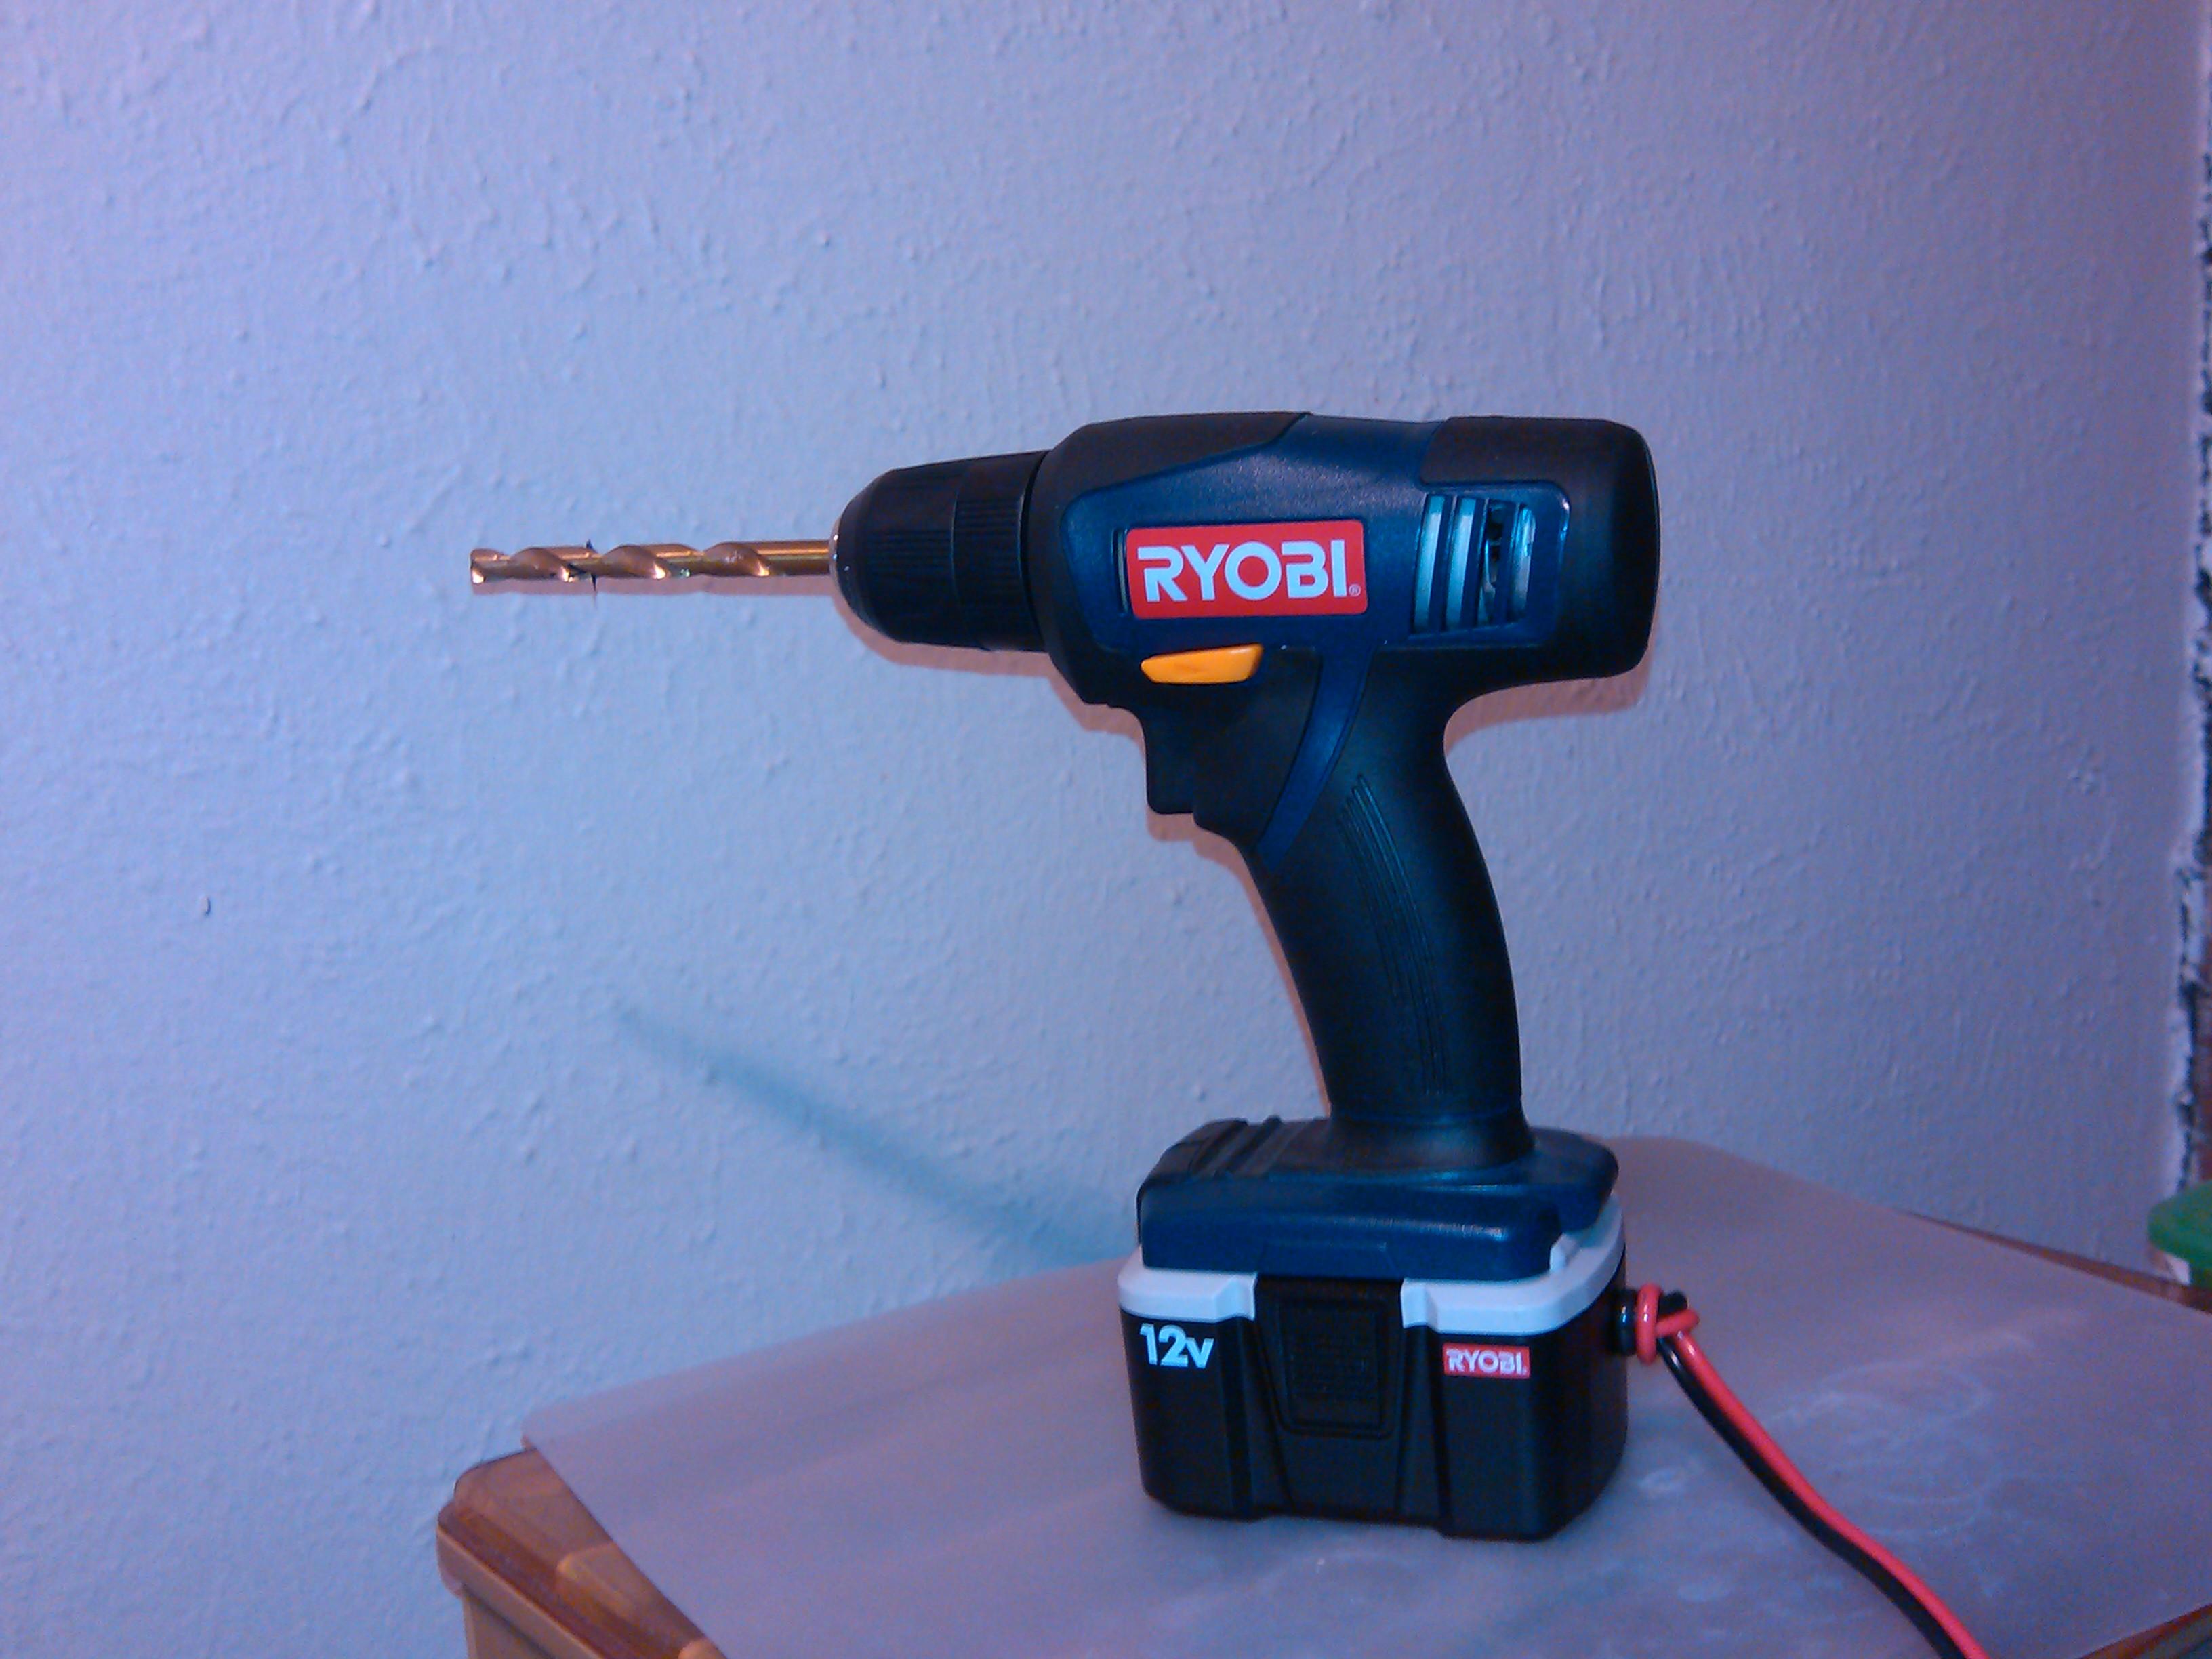 Picture of RYOBI Drill 12v Rebuild